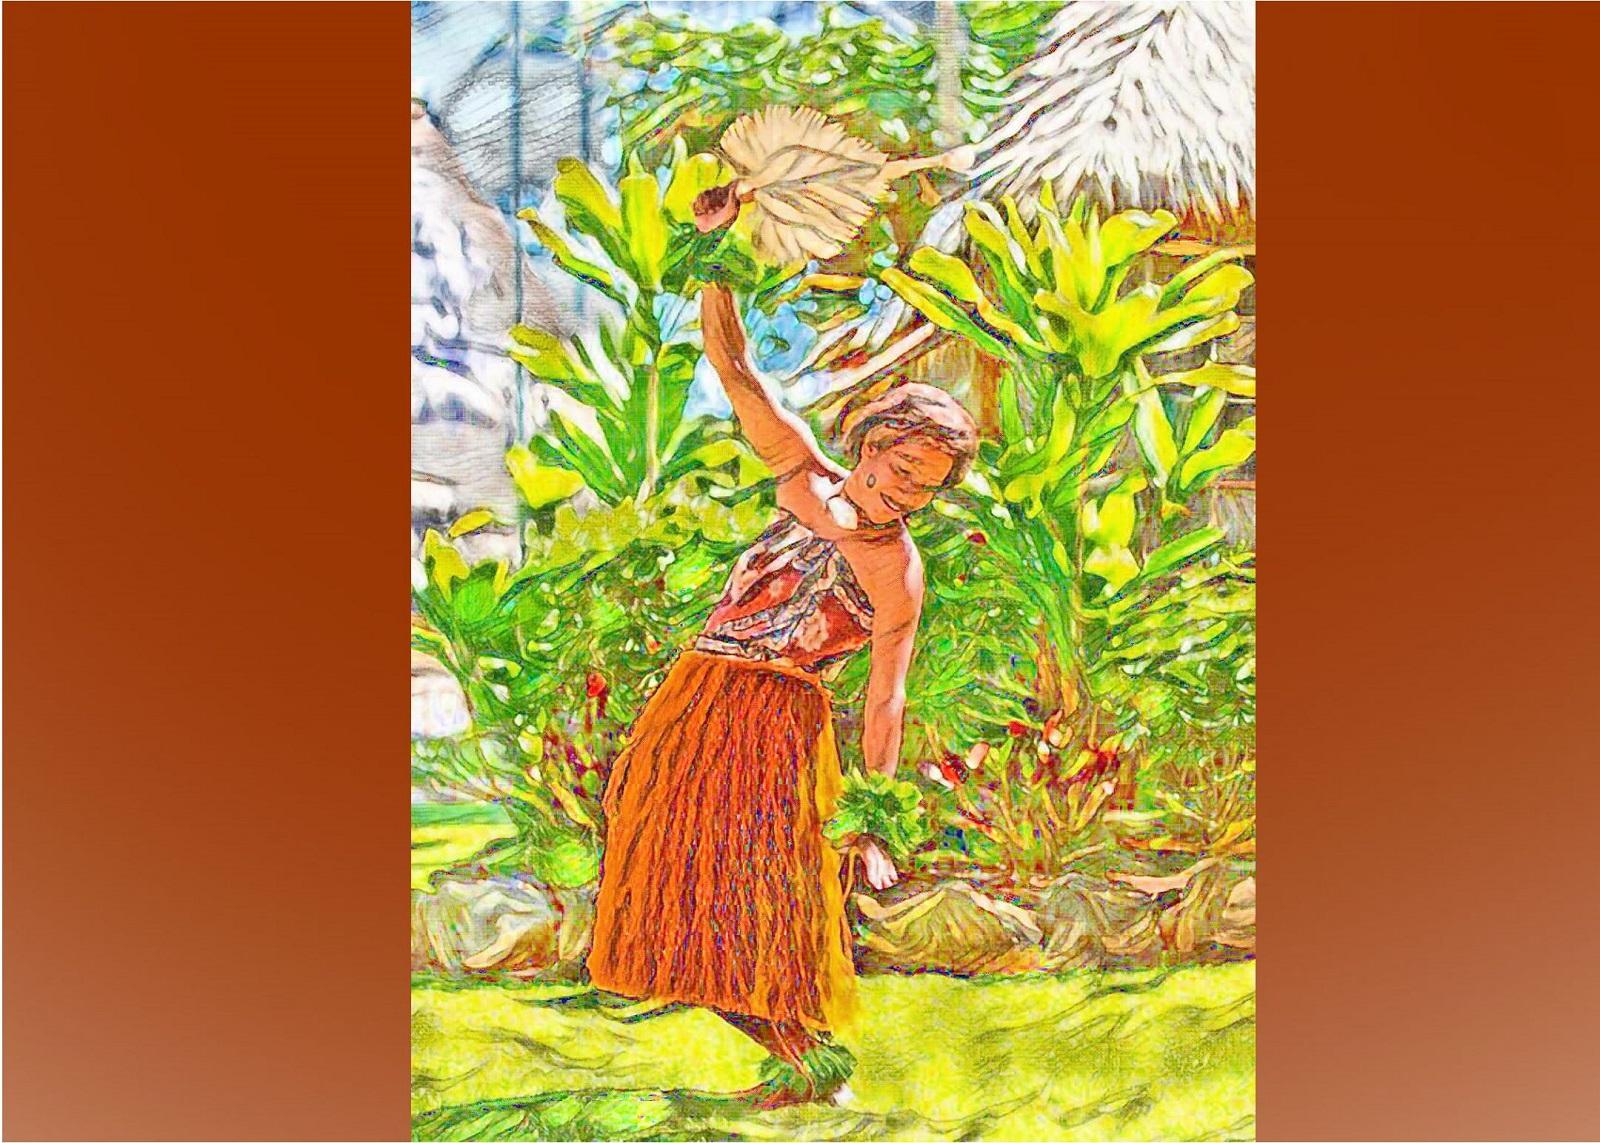 The Red Prawns of Vatulele – a Fijian legend